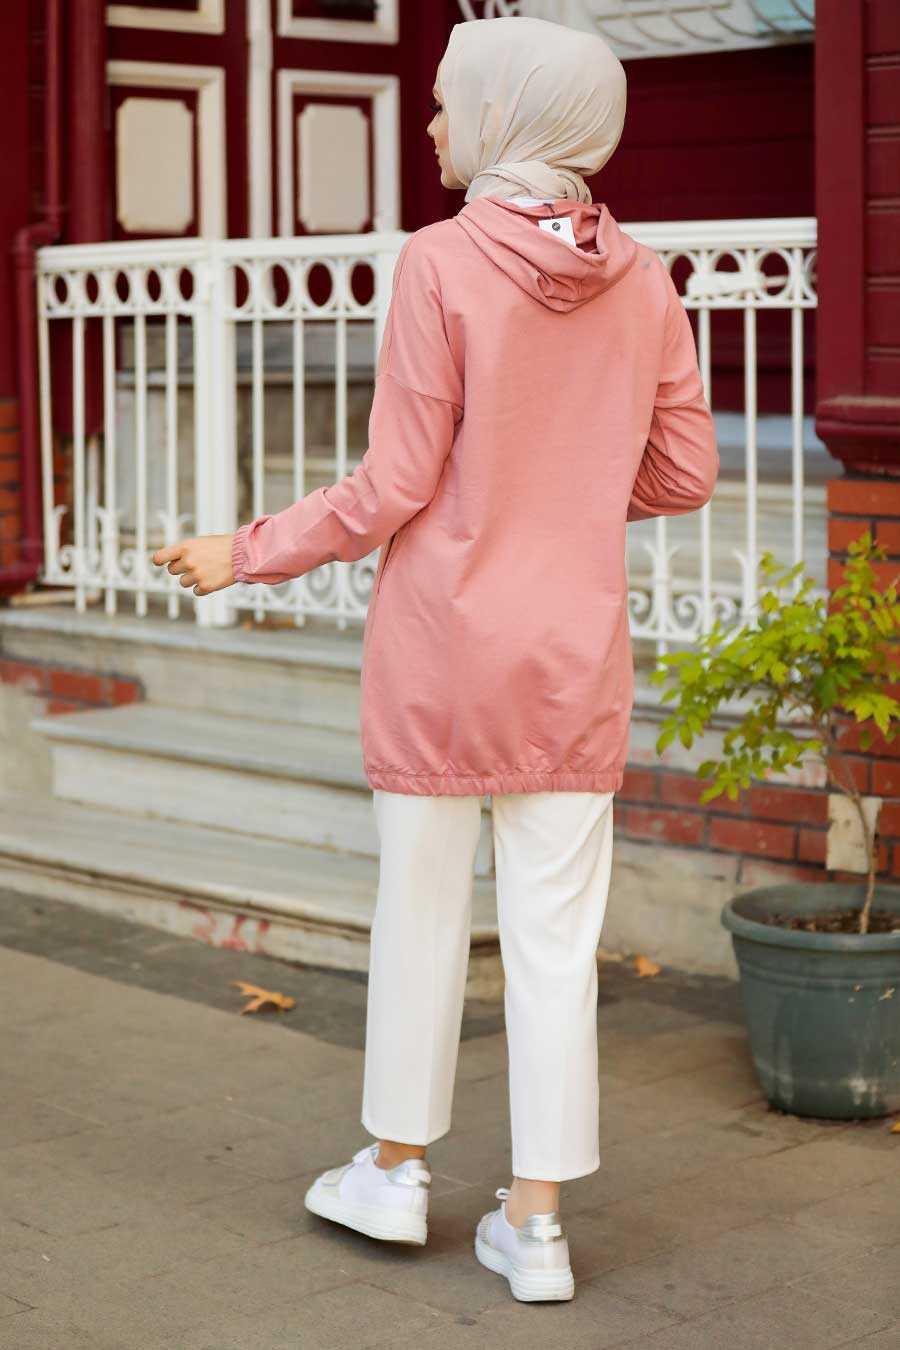 Dusty Rose Hijab Sweatshirt & Tunic 4135GK